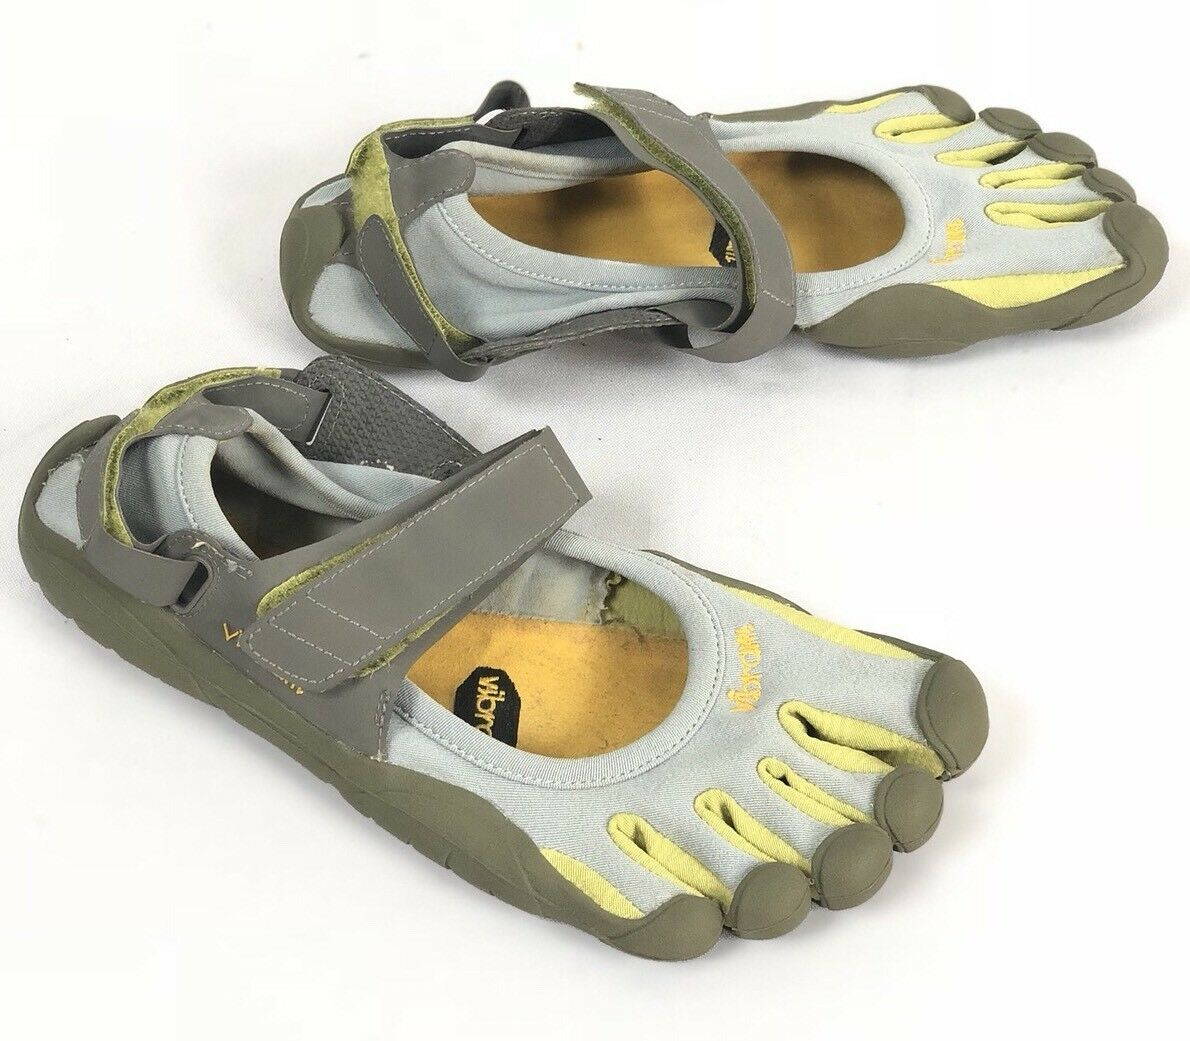 Vibram Sprint Women's Five Fingers  W119 Running shoes Size 38 US 7.5